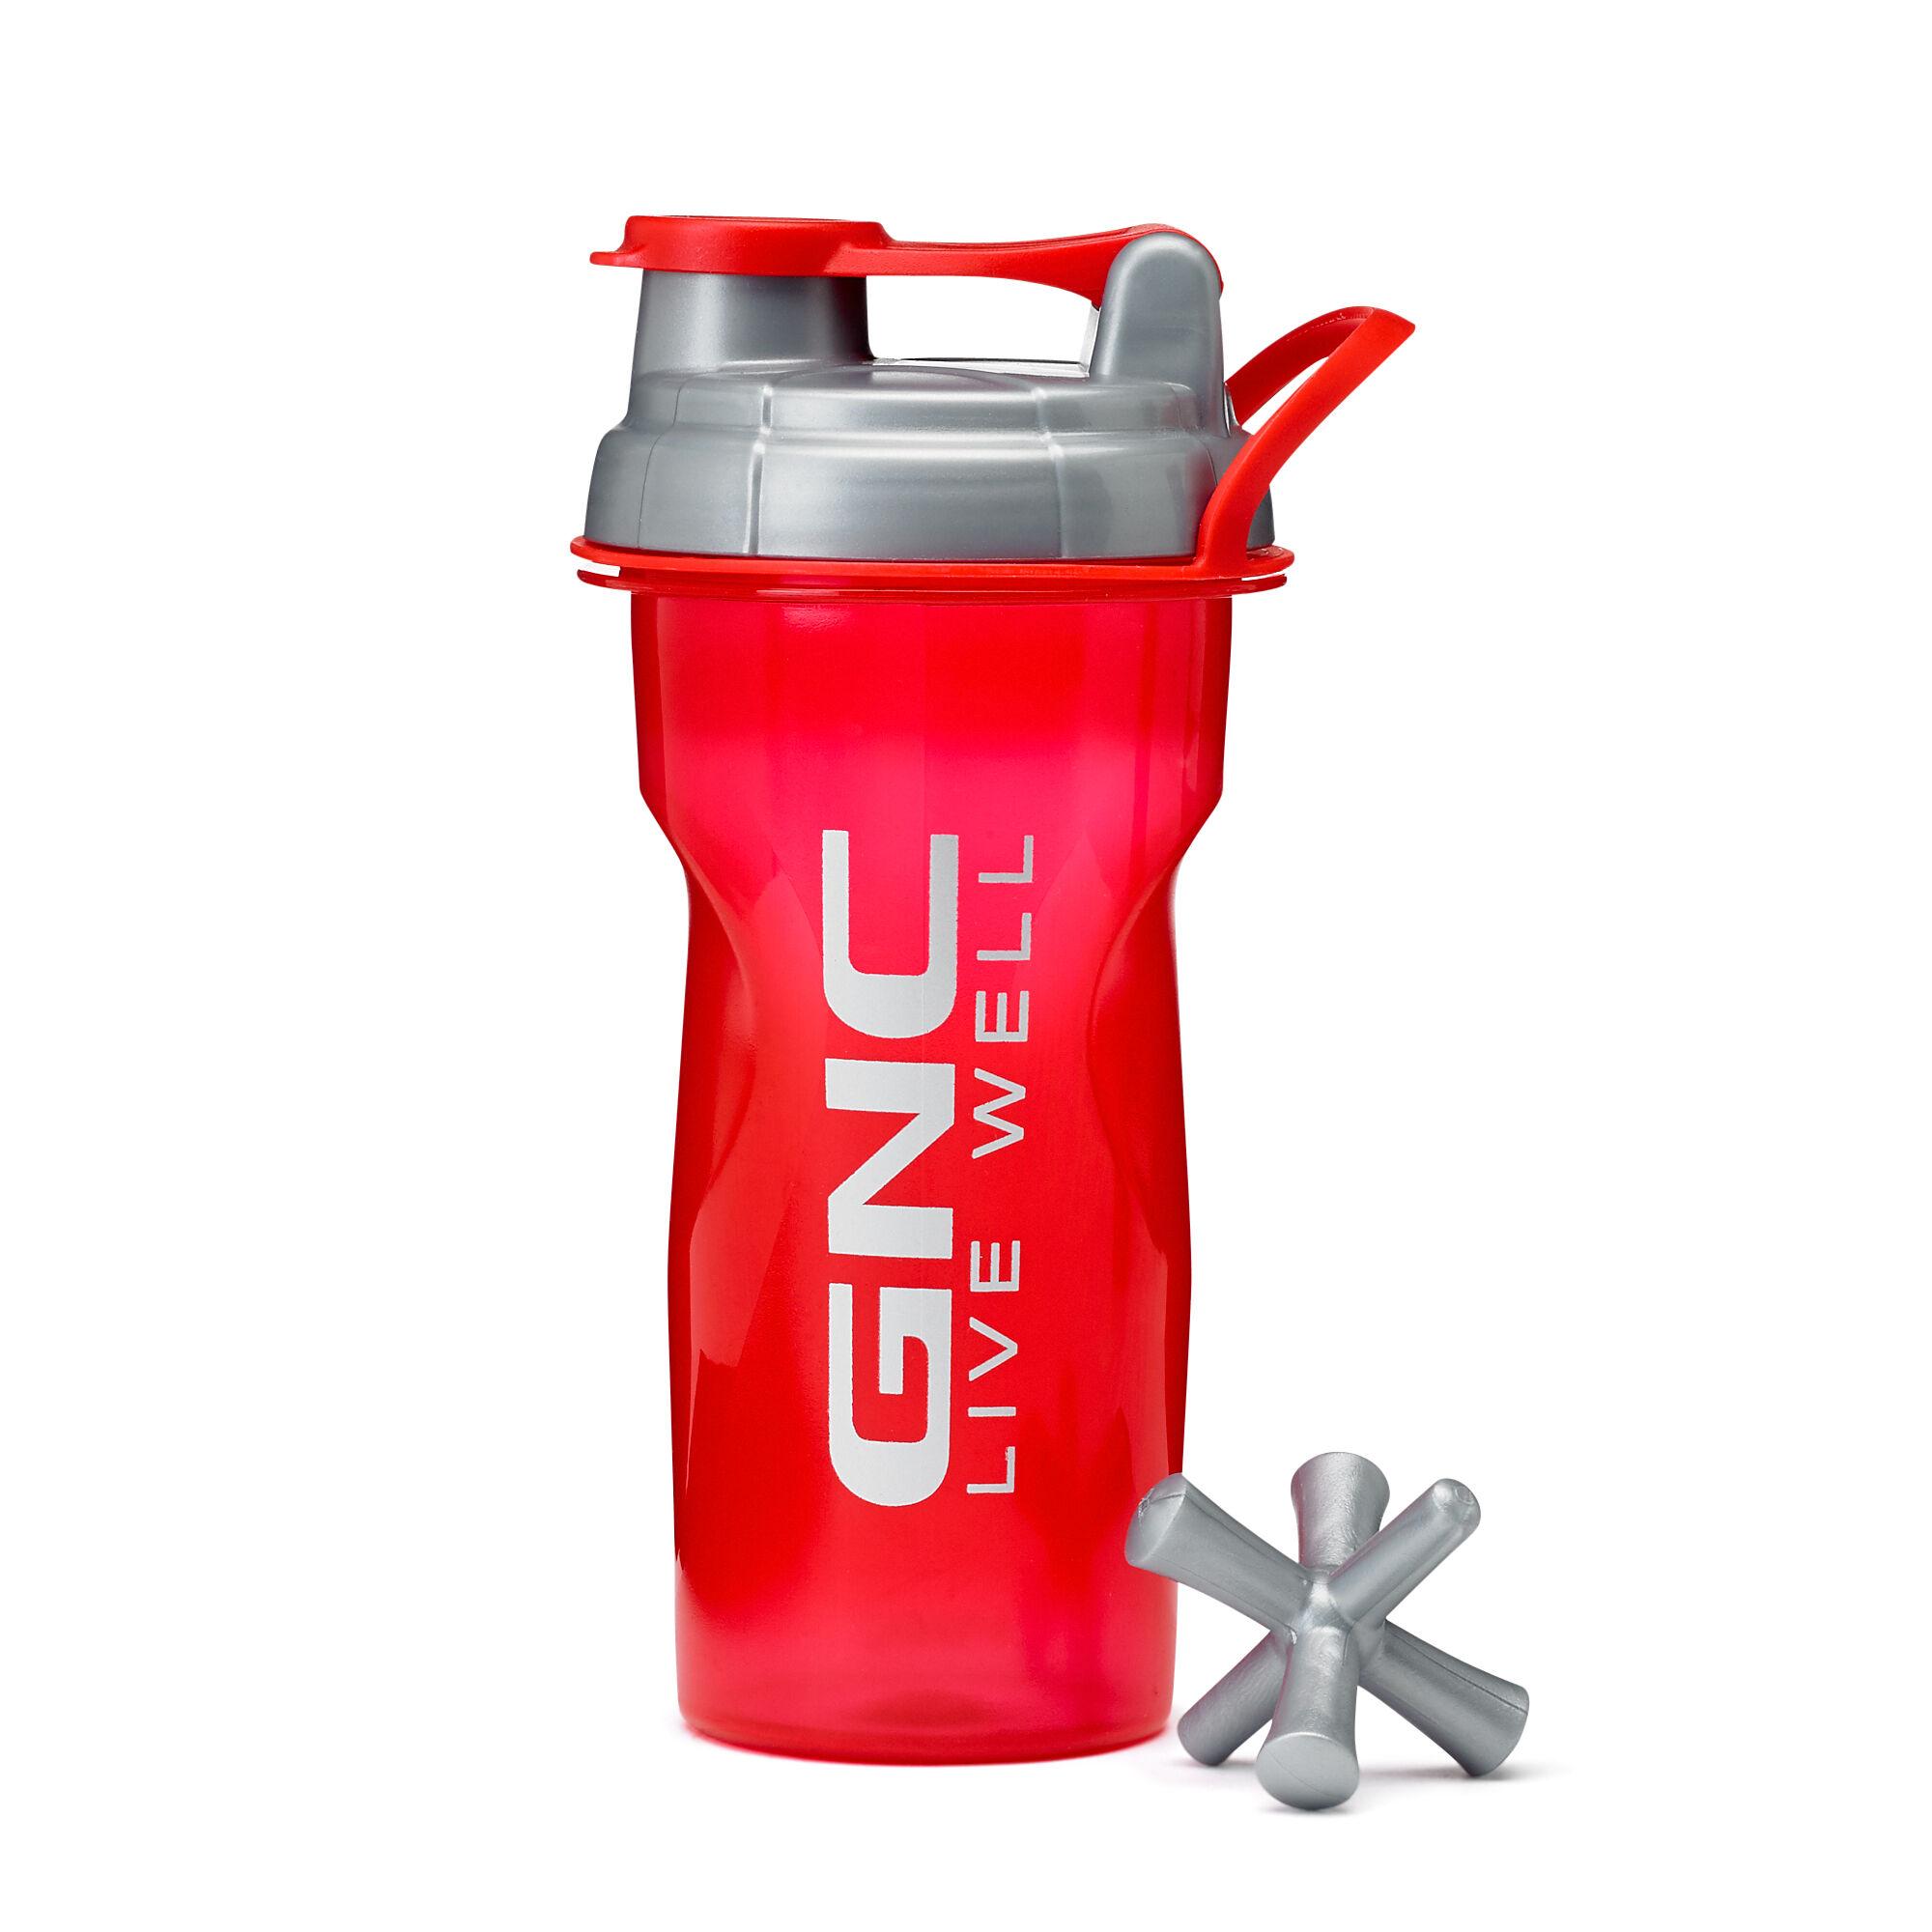 GNC 28oz JAXX™ Shaker Cup - Red